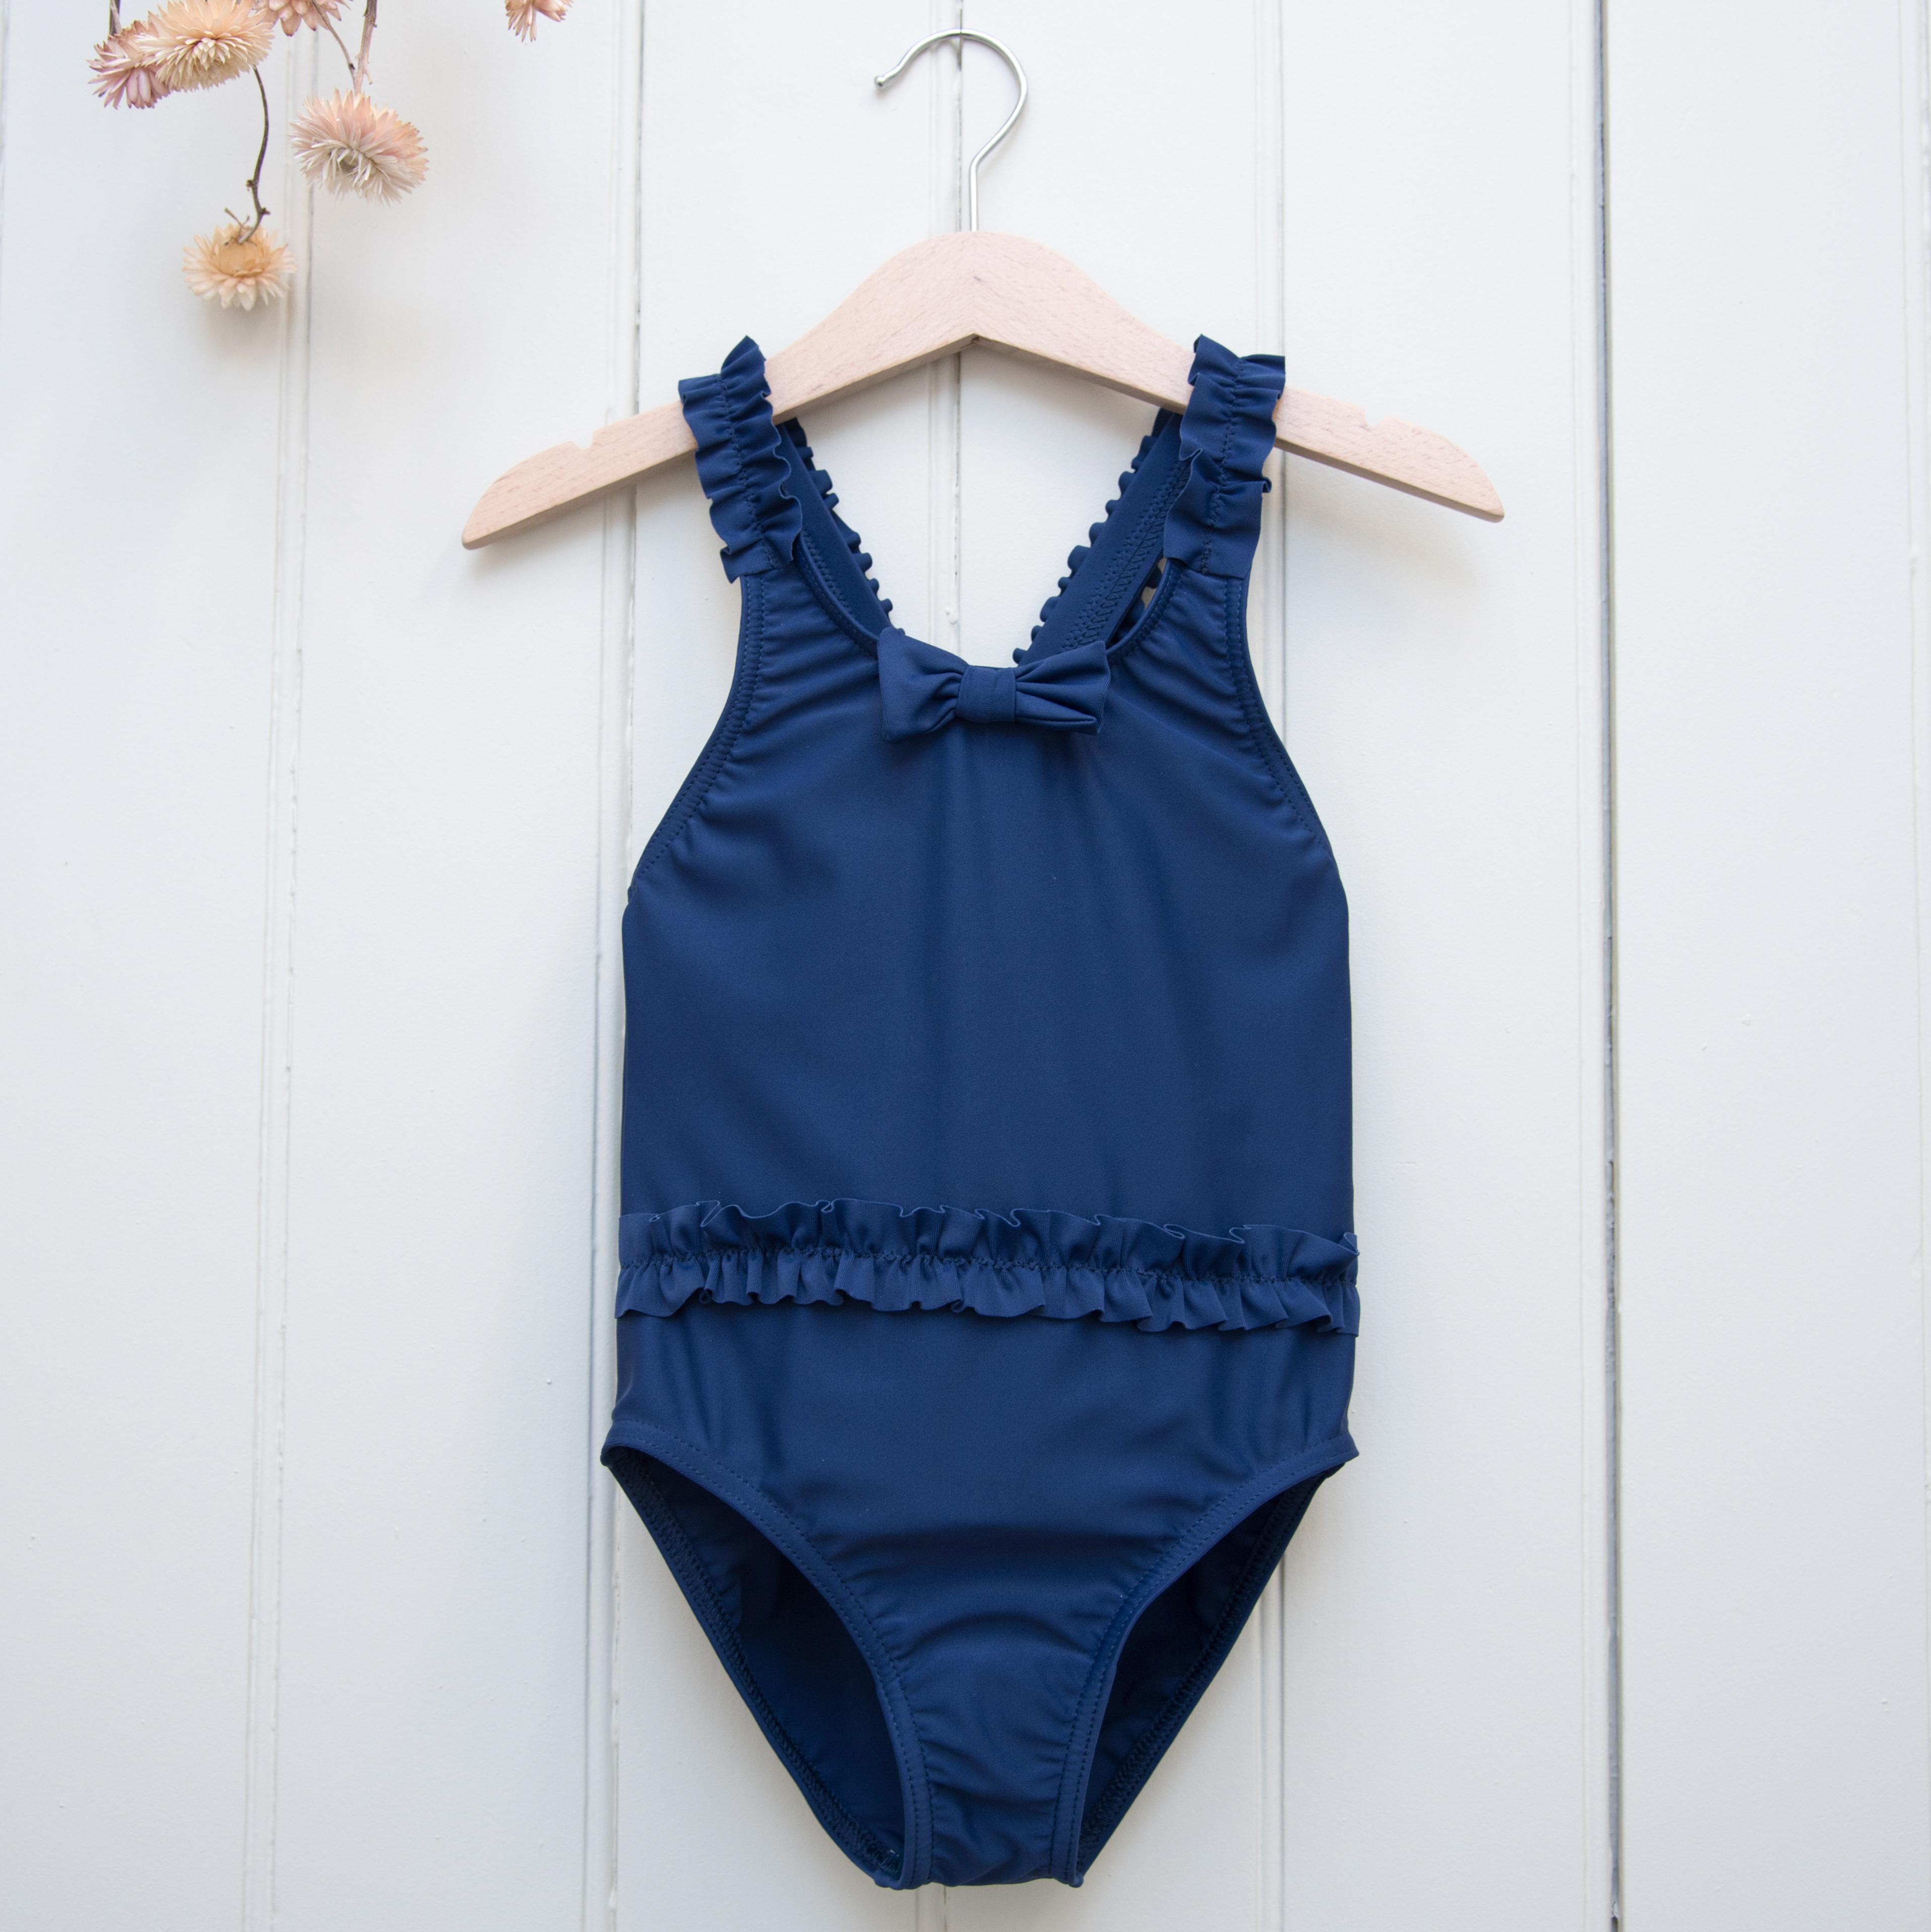 Les Petits Dorés法國時尚泳裝 / LOUISE經典抗UV系列-海藍荷葉泳裝